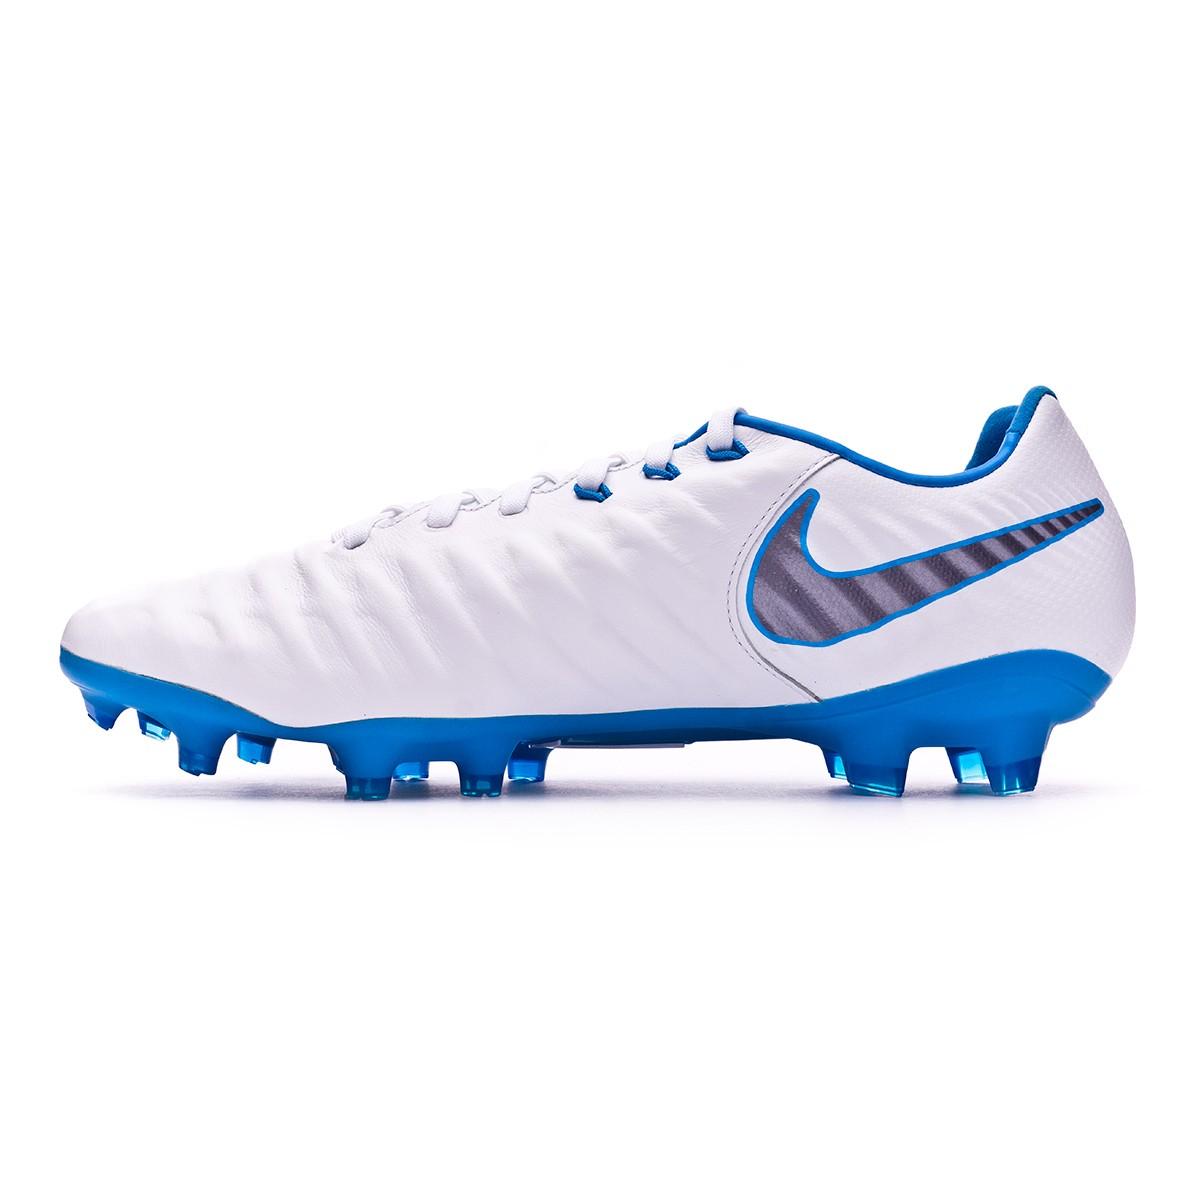 buy popular 03408 a26ca Football Boots Nike Tiempo Legend VII Pro FG White-Metallic cool grey-Blue  hero - Tienda de fútbol Fútbol Emotion